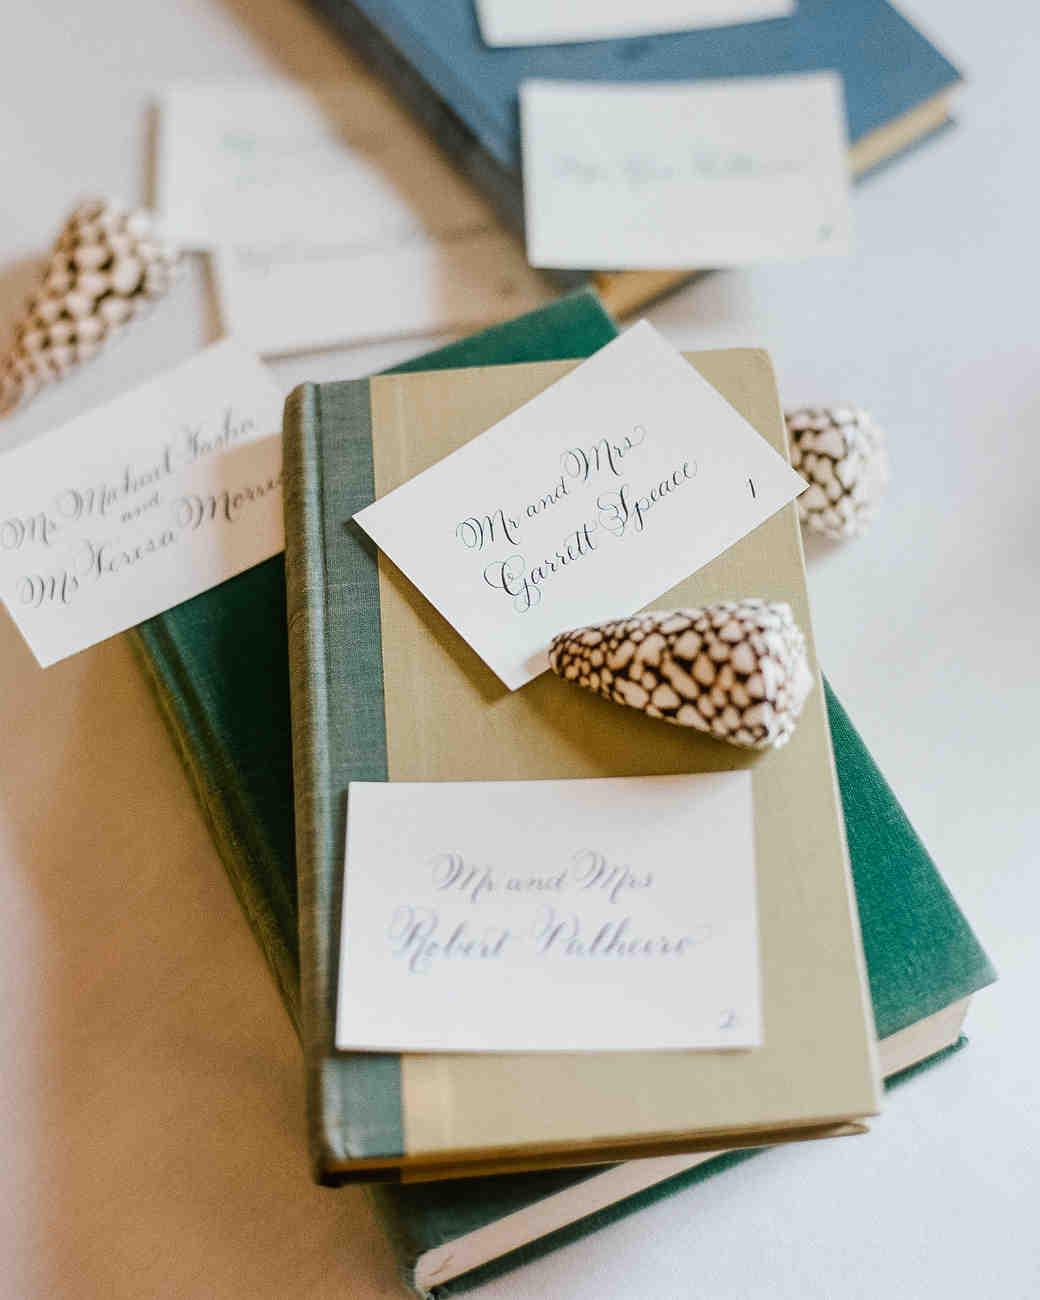 lindsay-garrett-wedding-escortcards-0689-s111850-0415.jpg